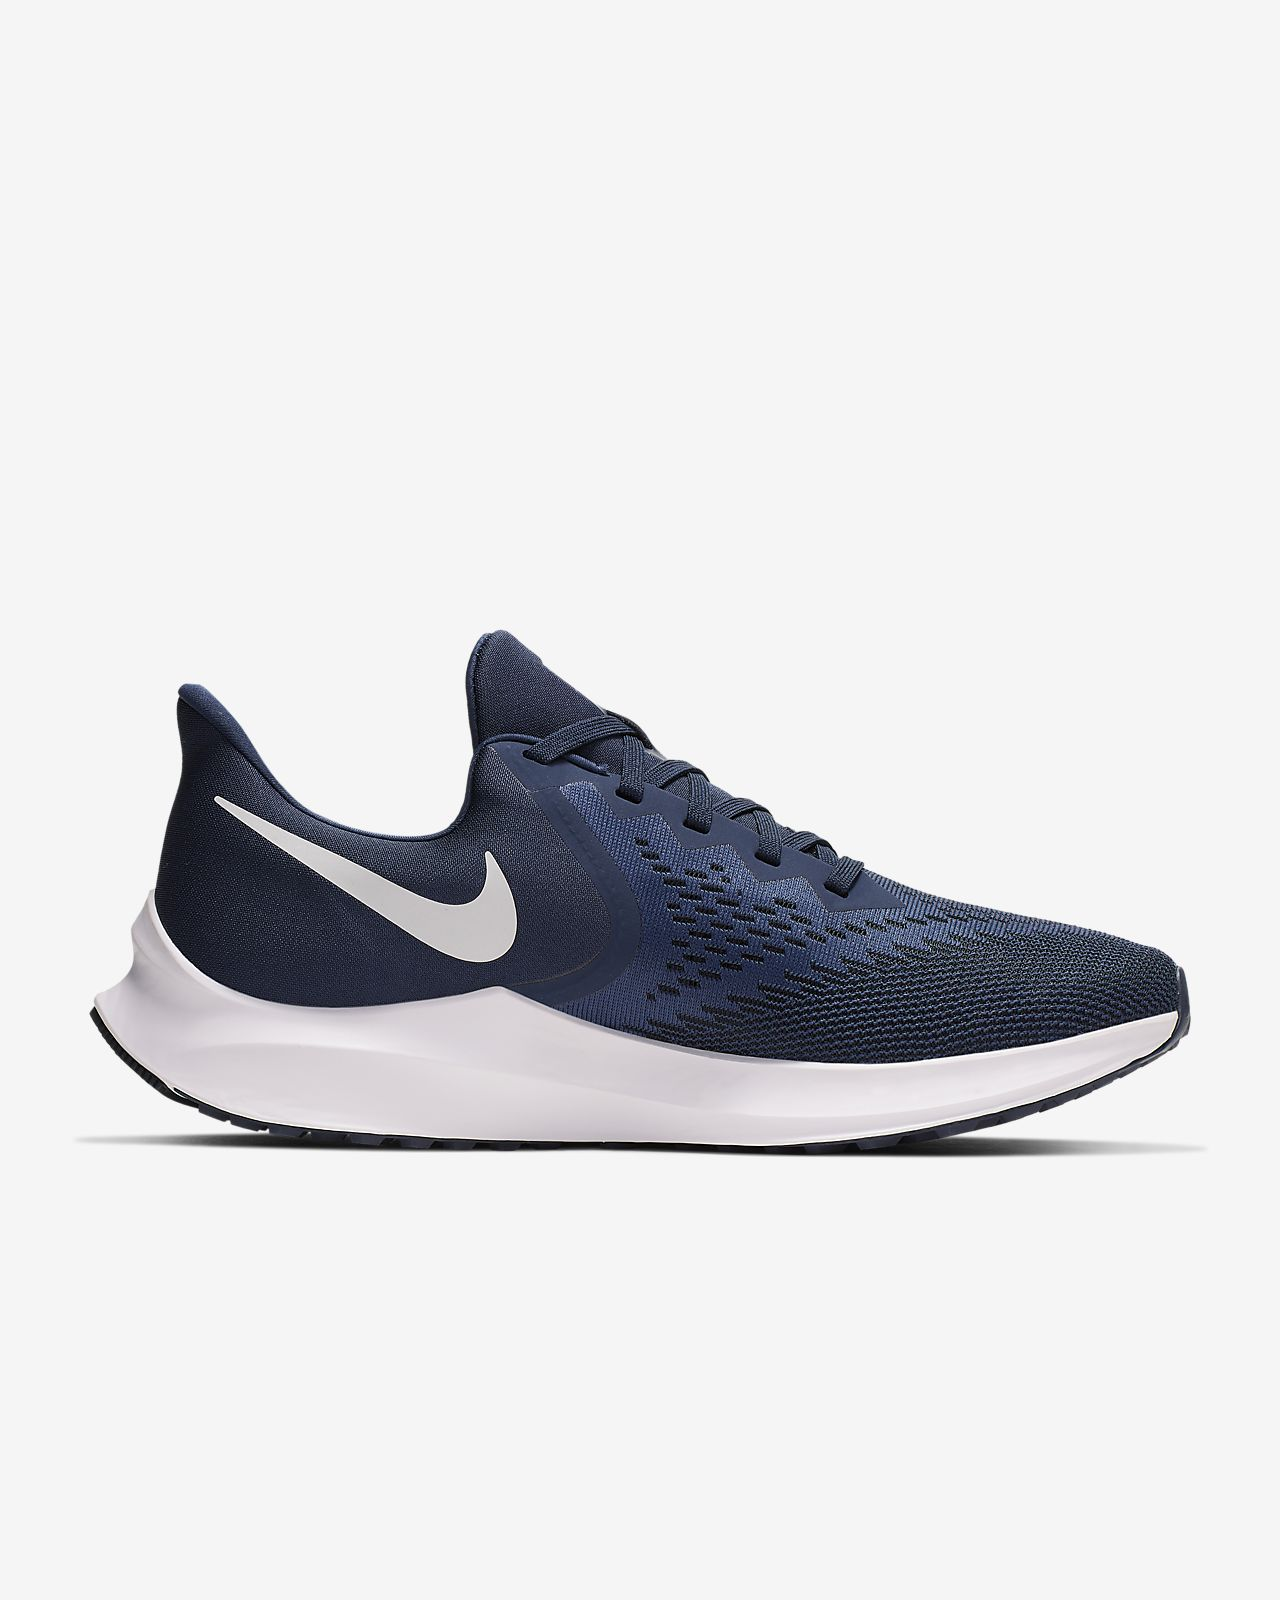 Sapatilhas de running Nike Air Zoom Winflo 6 para homem